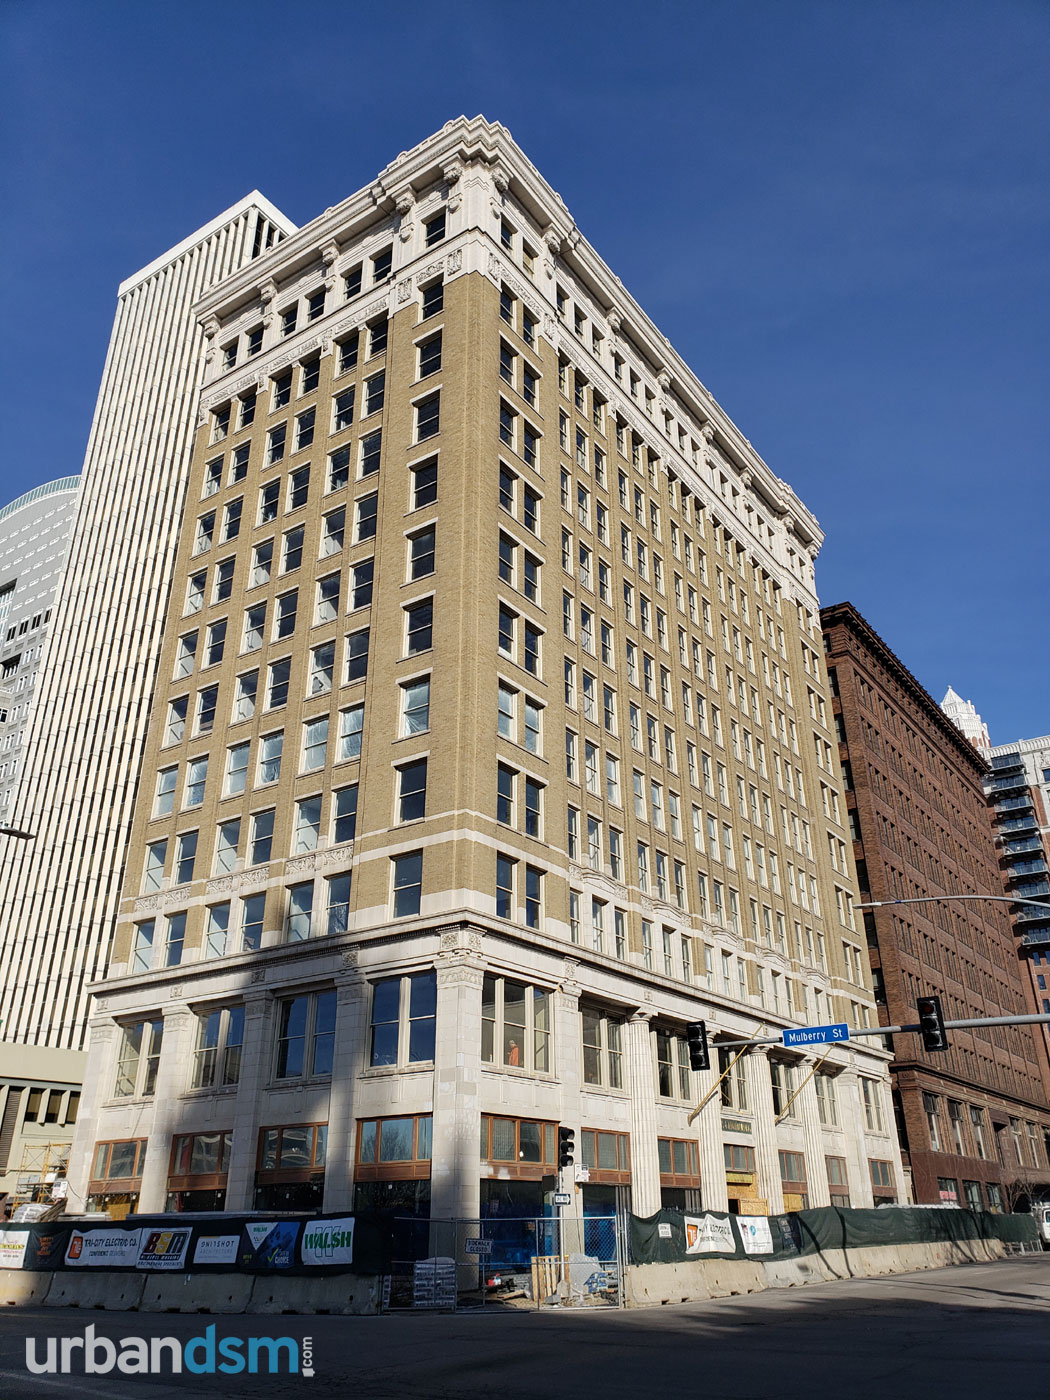 Hippee Building (Modern: Surety Hotel). Photo taken in March, 2020.